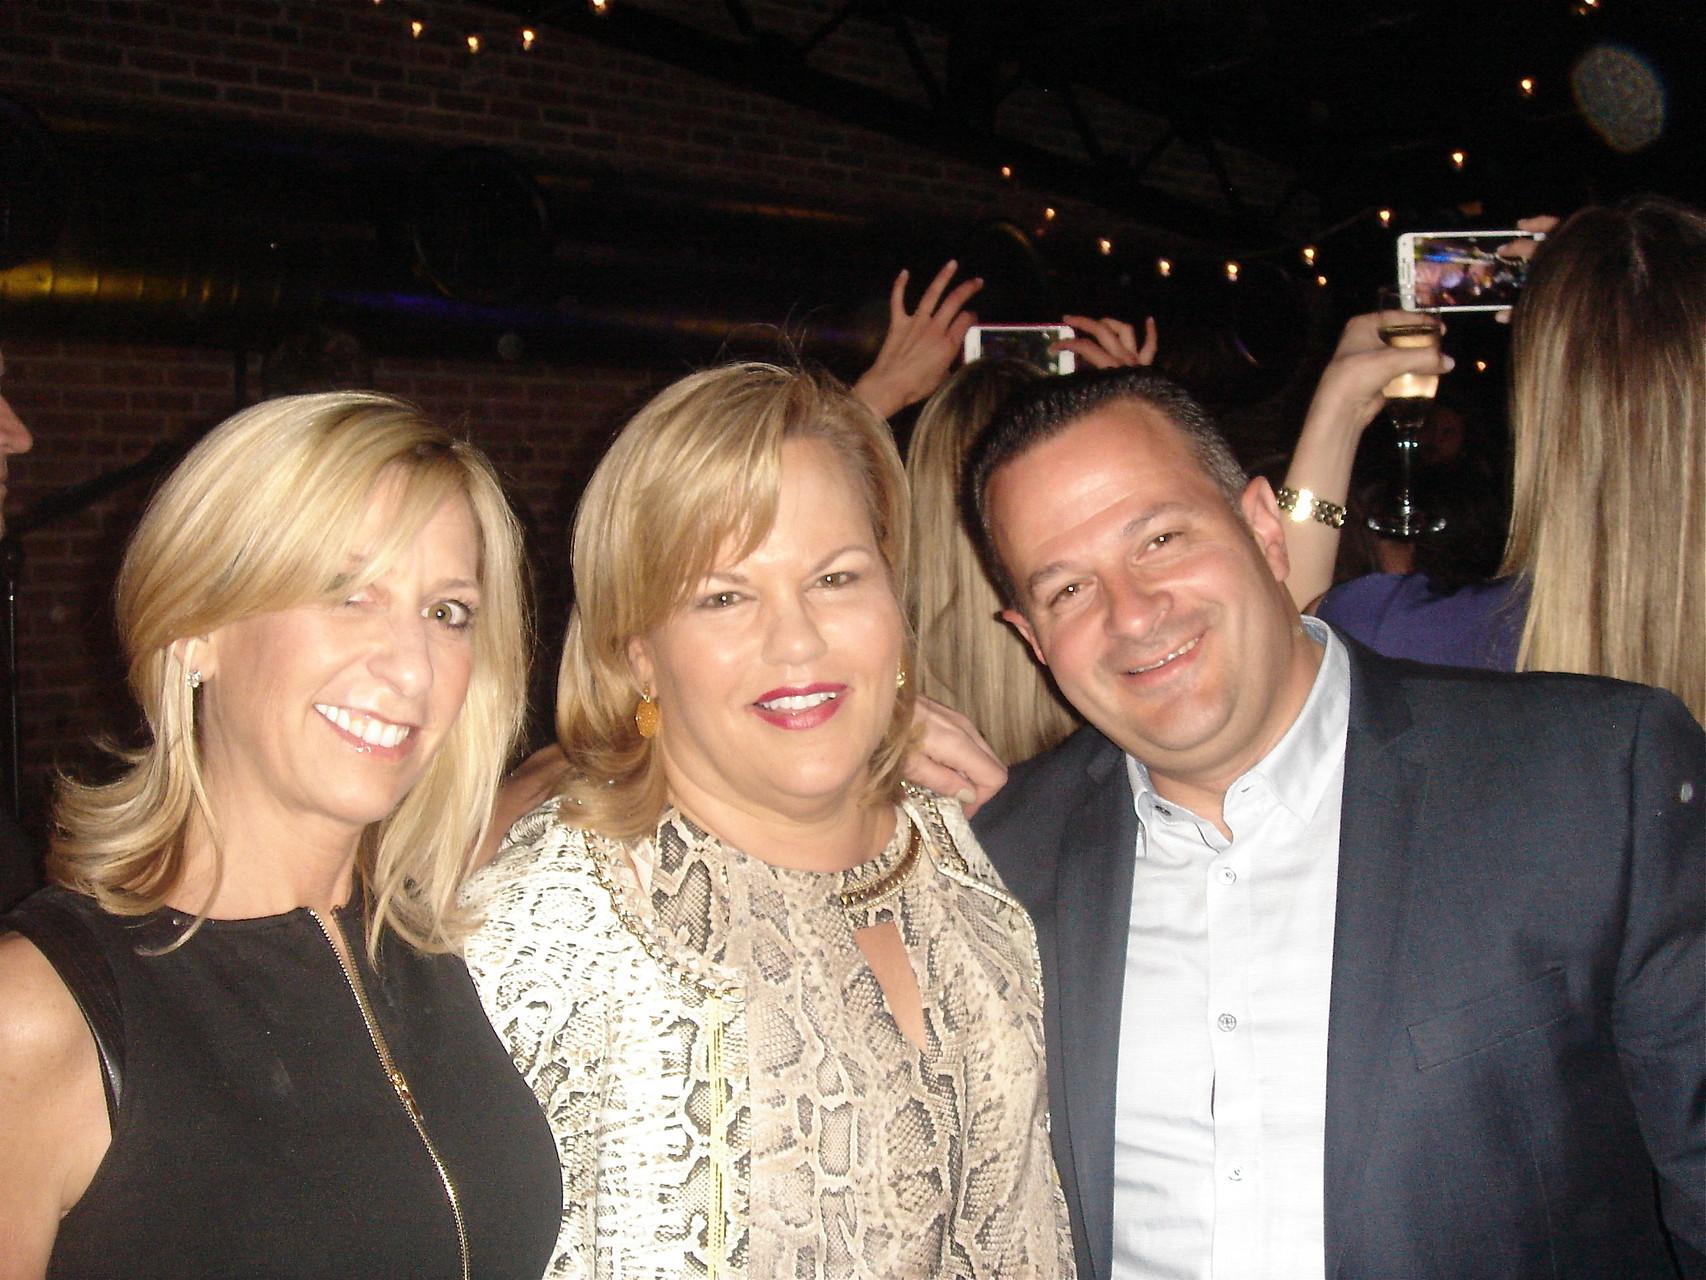 A friend, Celeste, & Anthony Donnarumma